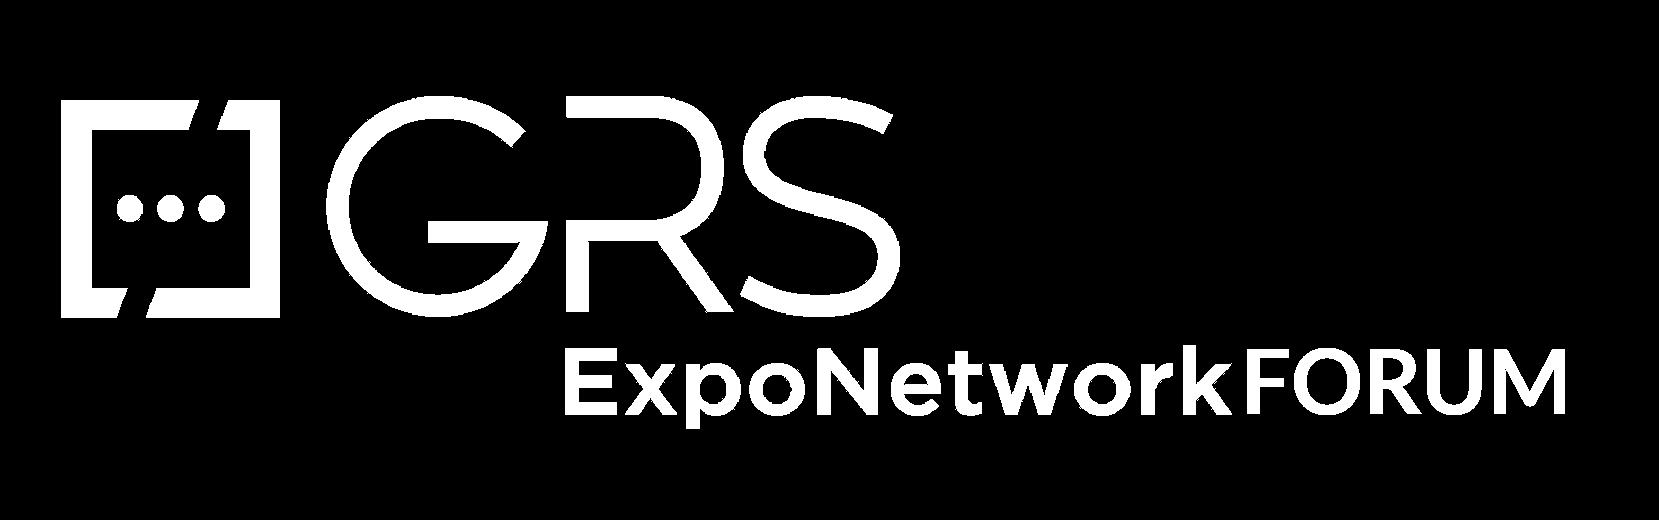 LogoGRS_ExpoNetworkForum_white